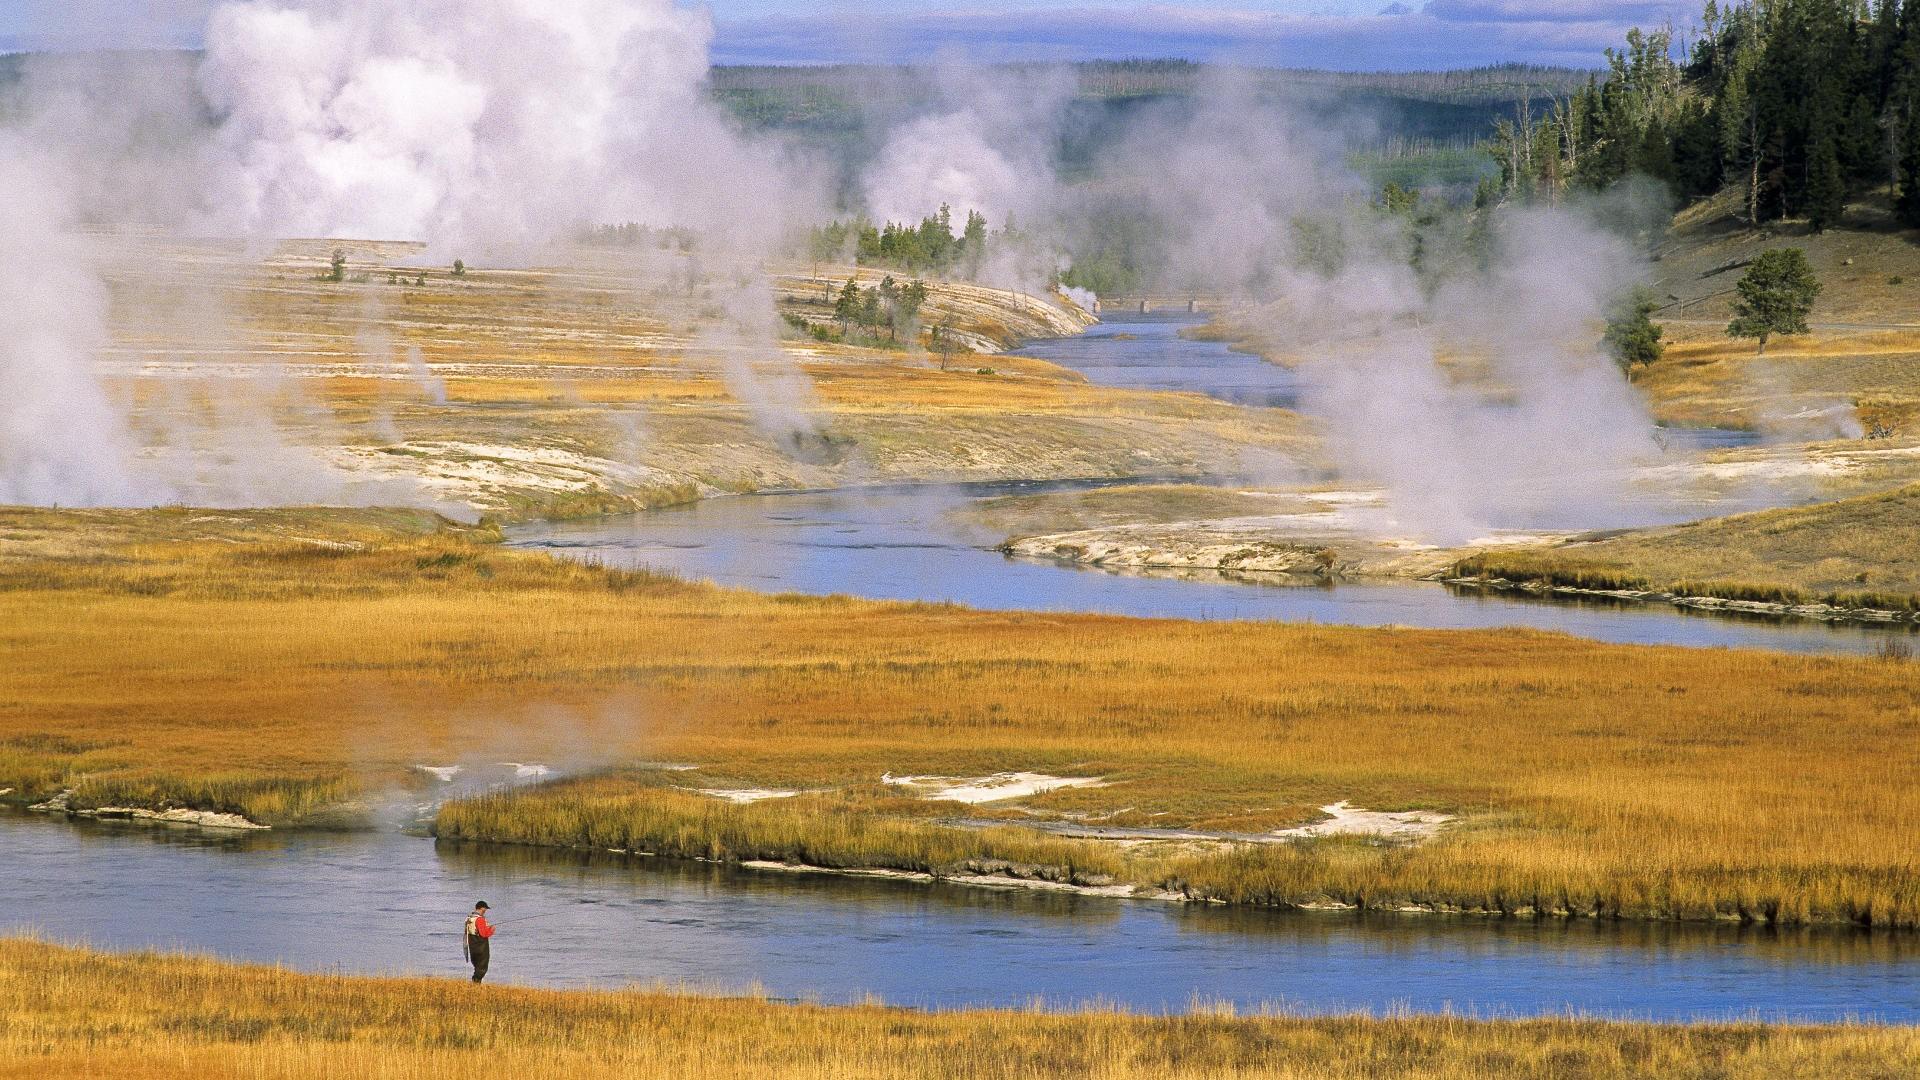 Yellowstone National Park wallpaper 1920x1080 227640 WallpaperUP 1920x1080